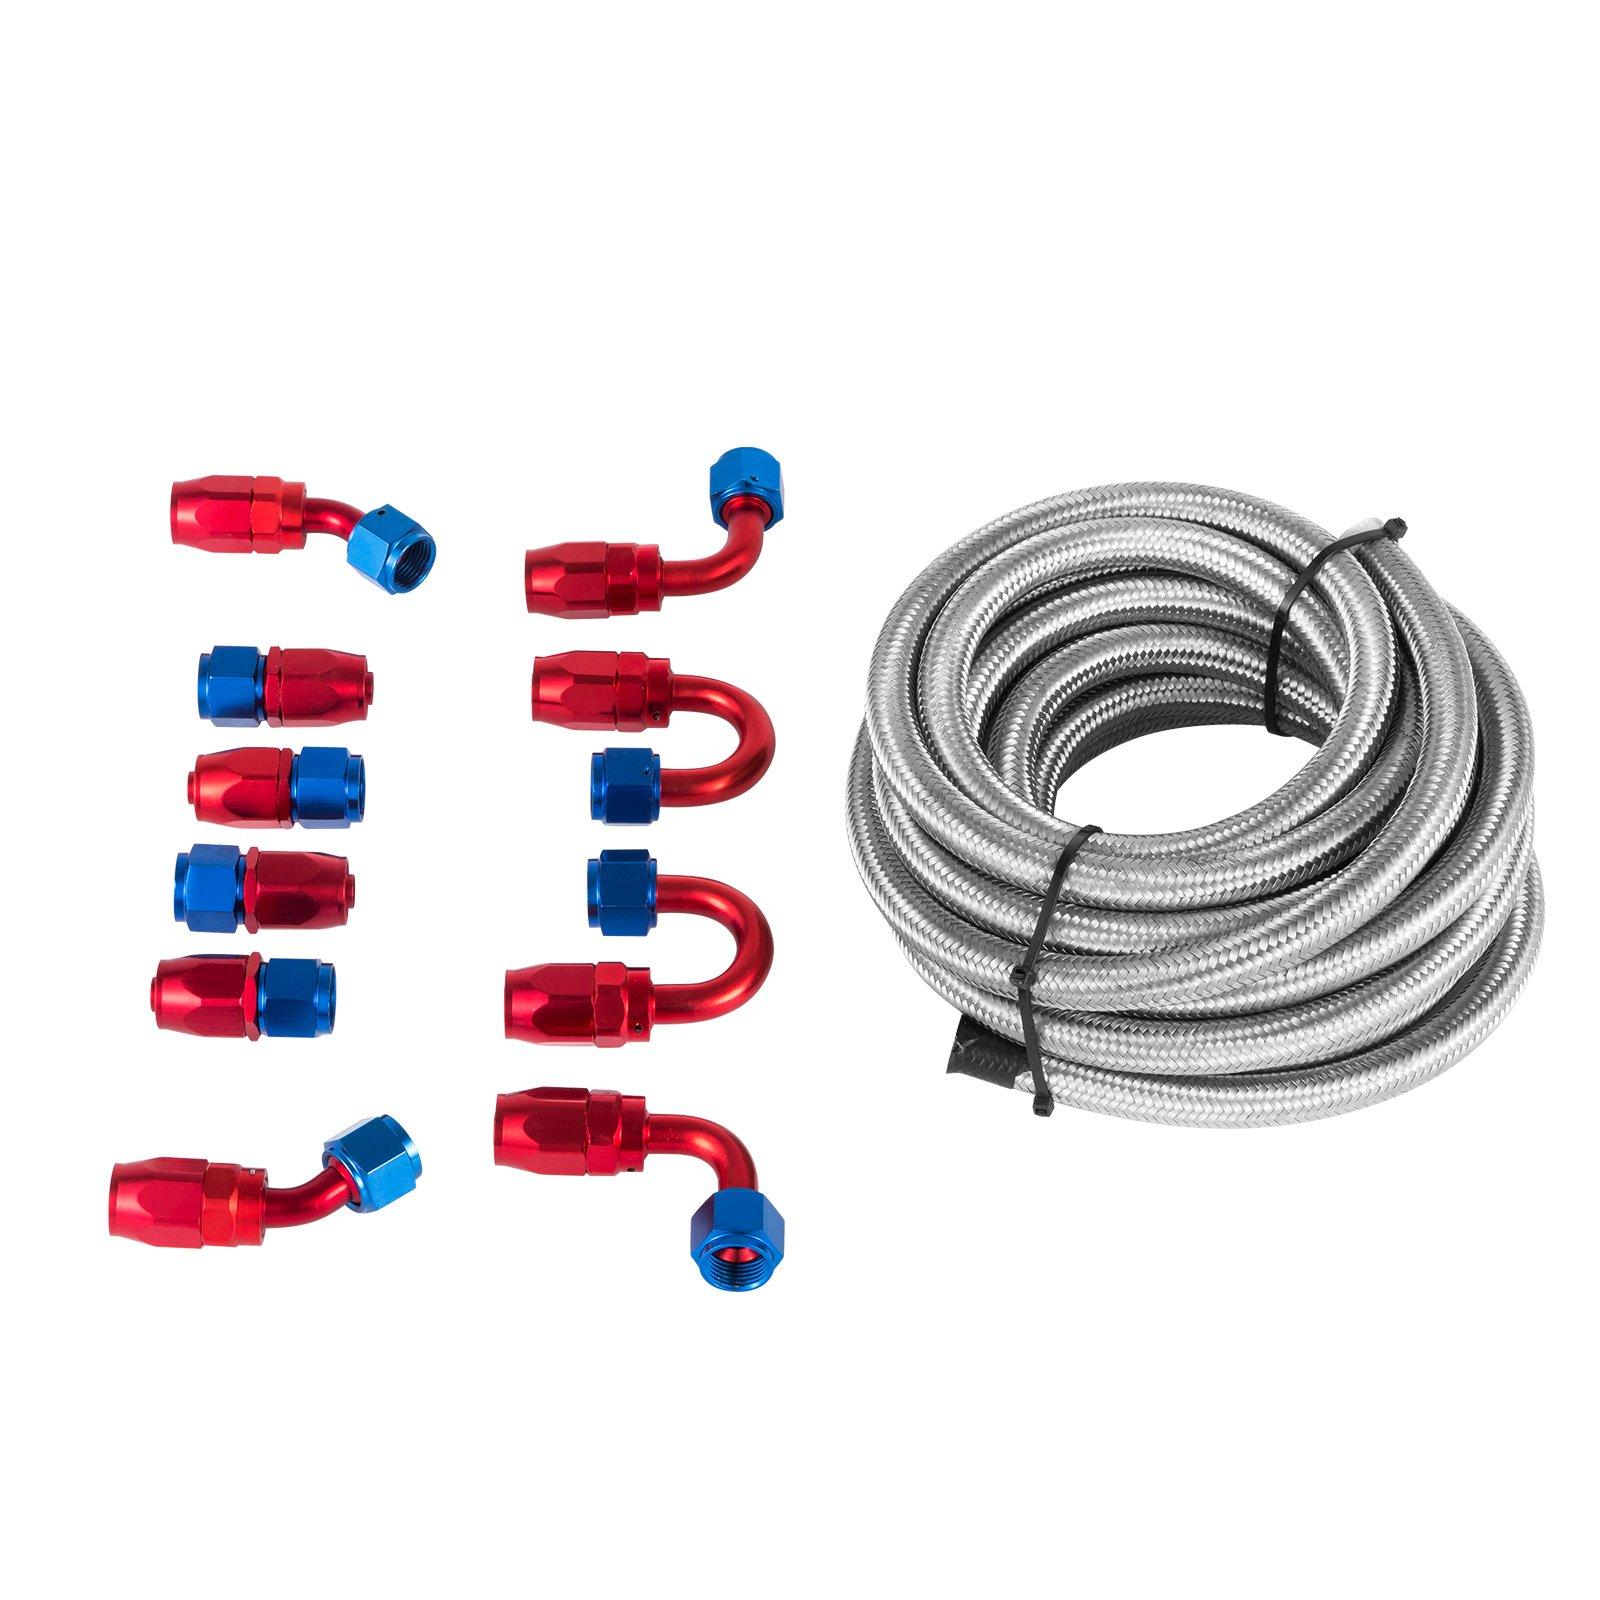 Cheap Nylon Fuel Line, find Nylon Fuel Line deals on line at